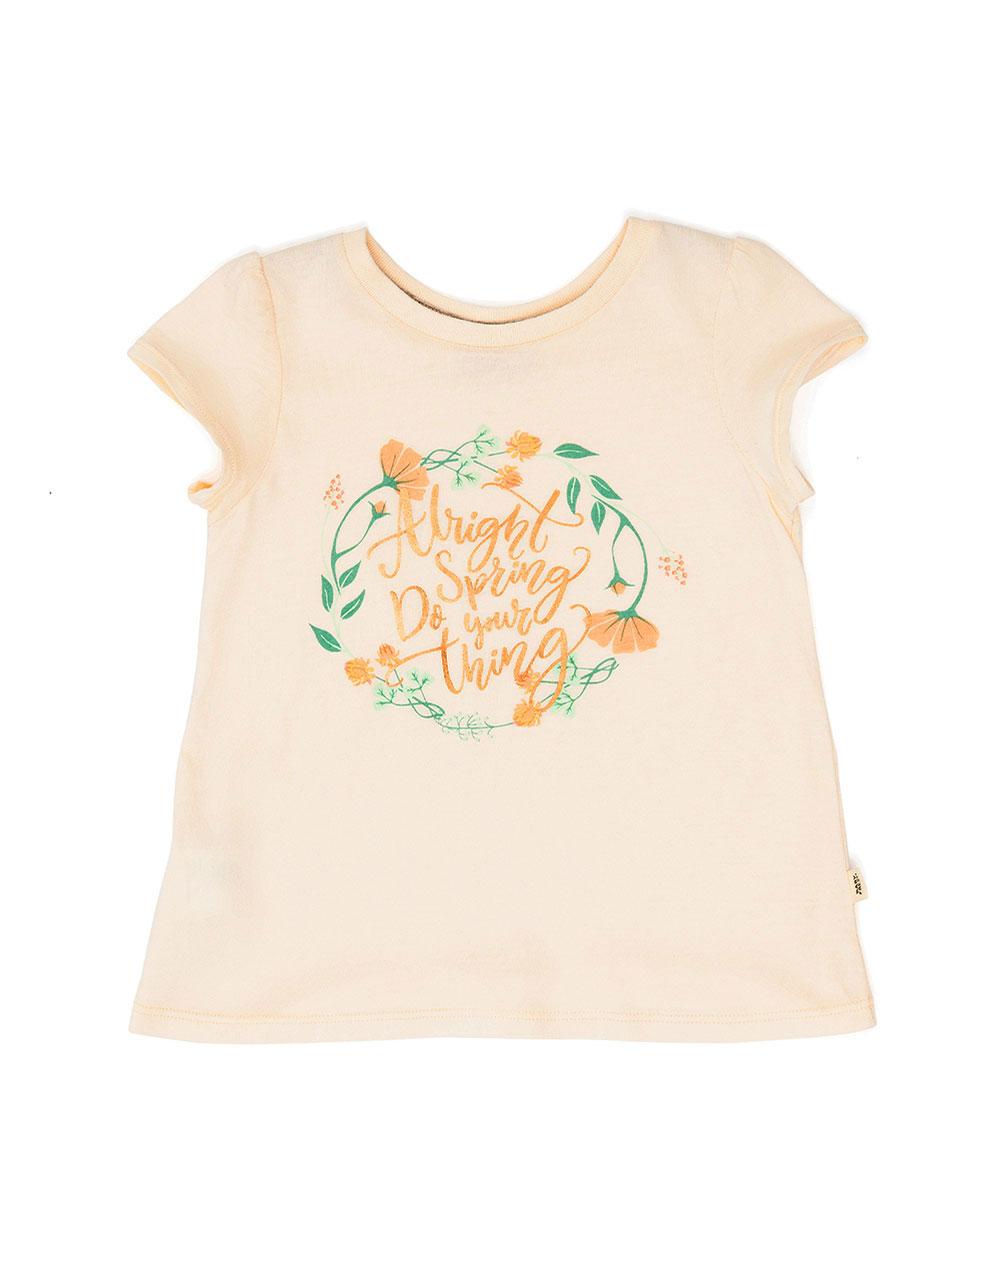 200e3b75a3e2 Ropa para Bebés Niñas - Promociones y Ofertas Baby Fresh